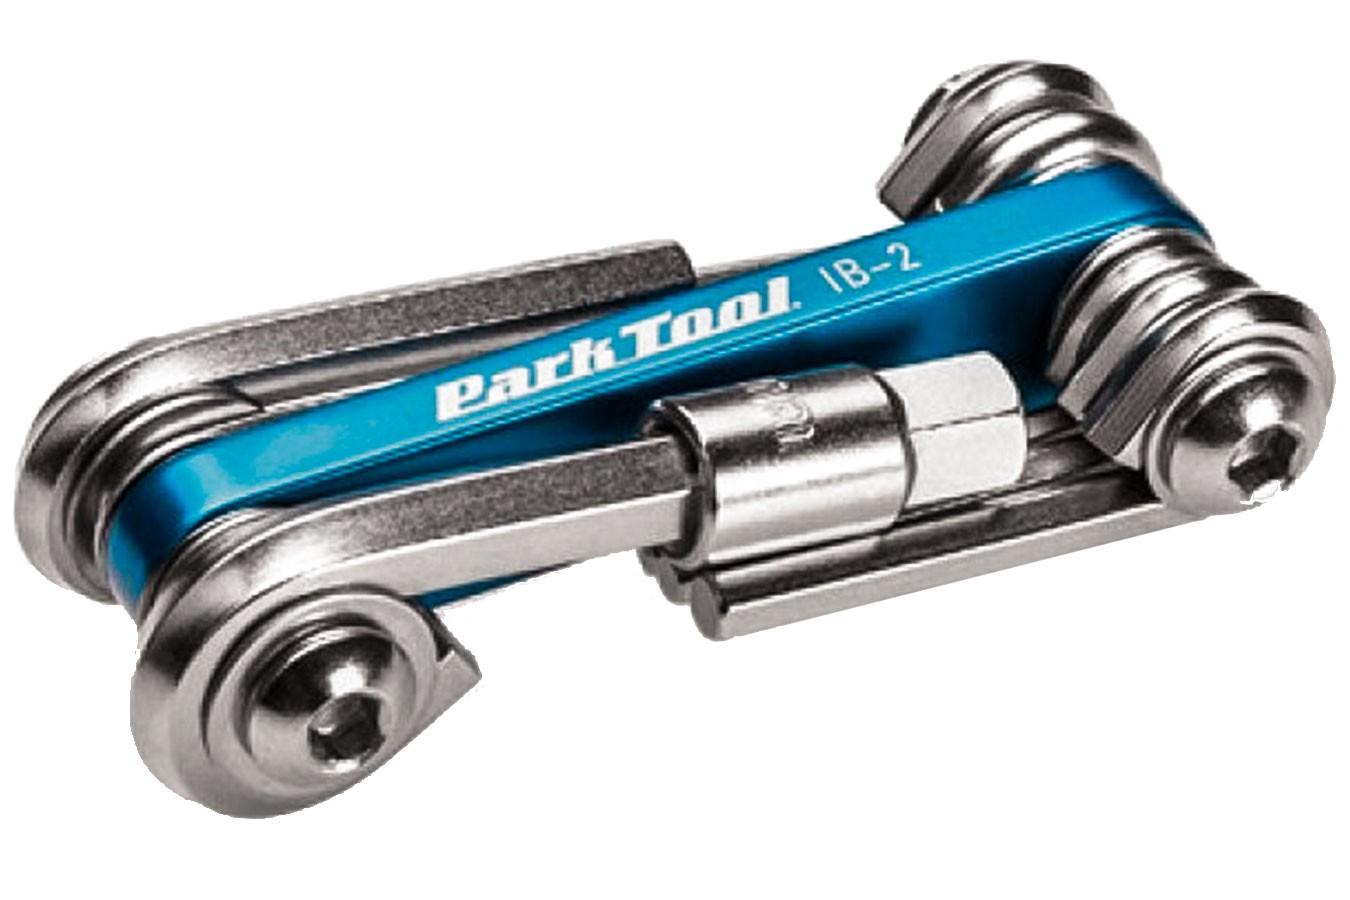 Canivete (Kit Ferramentas) 10 funções IB-2 Park Tool